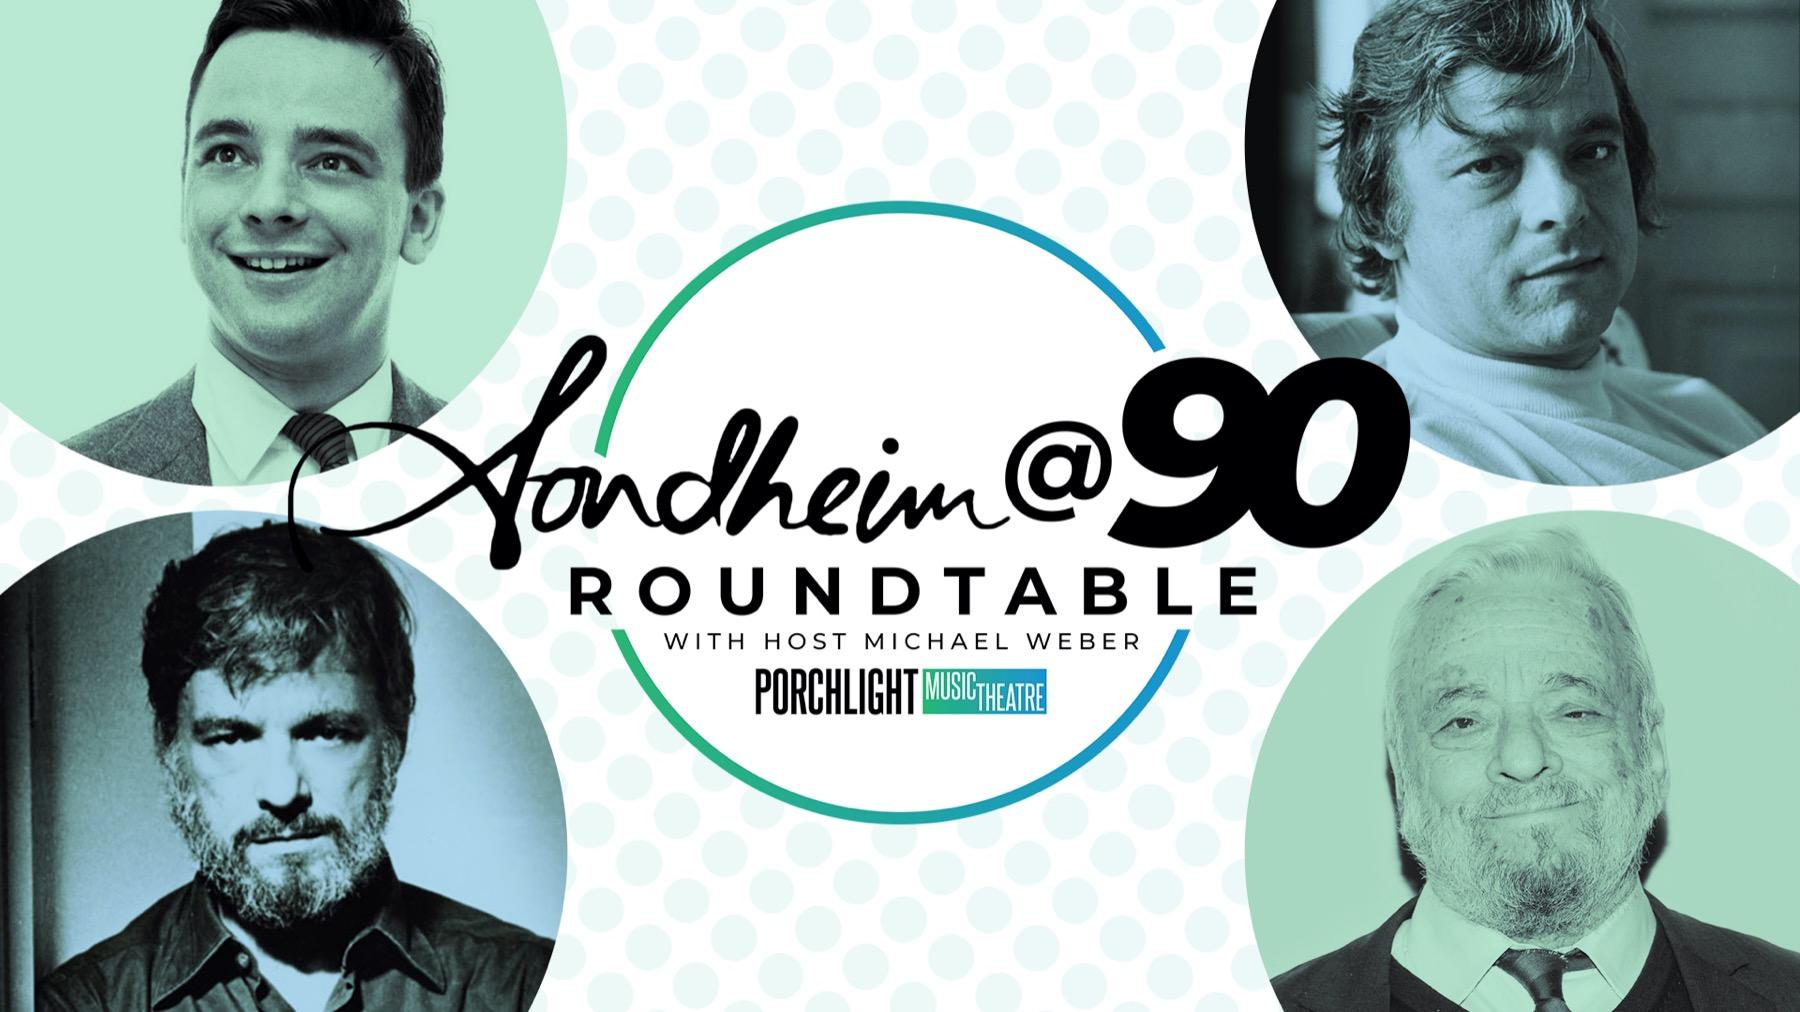 Porchlight Music Theatre's Sondheim @ 90 Roundtable